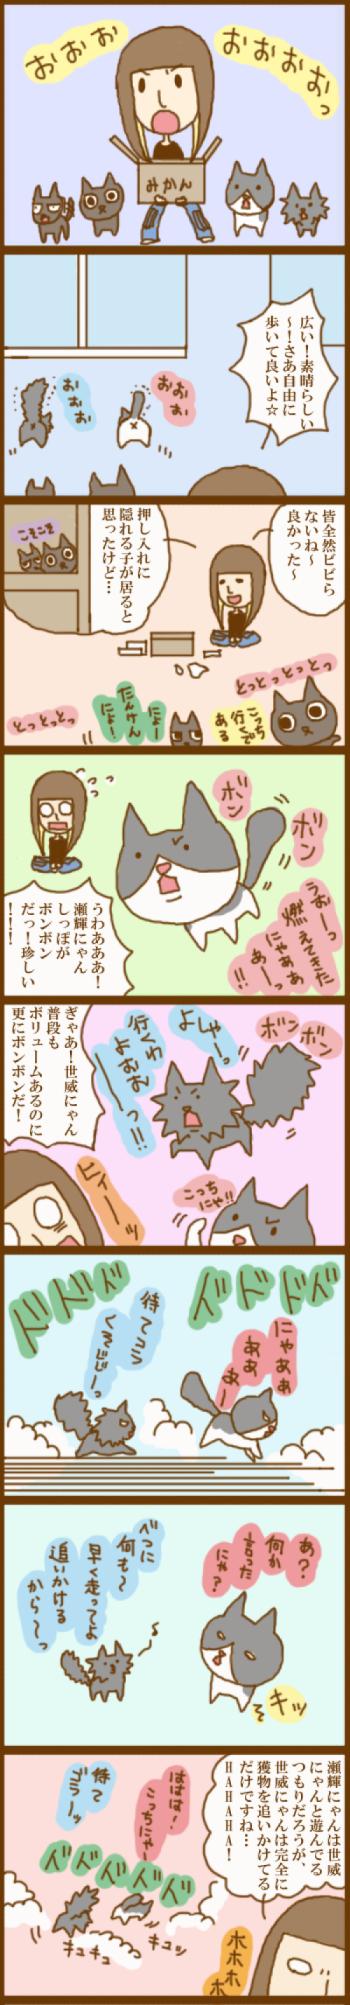 f:id:suzuokayu:20201117093429j:plain